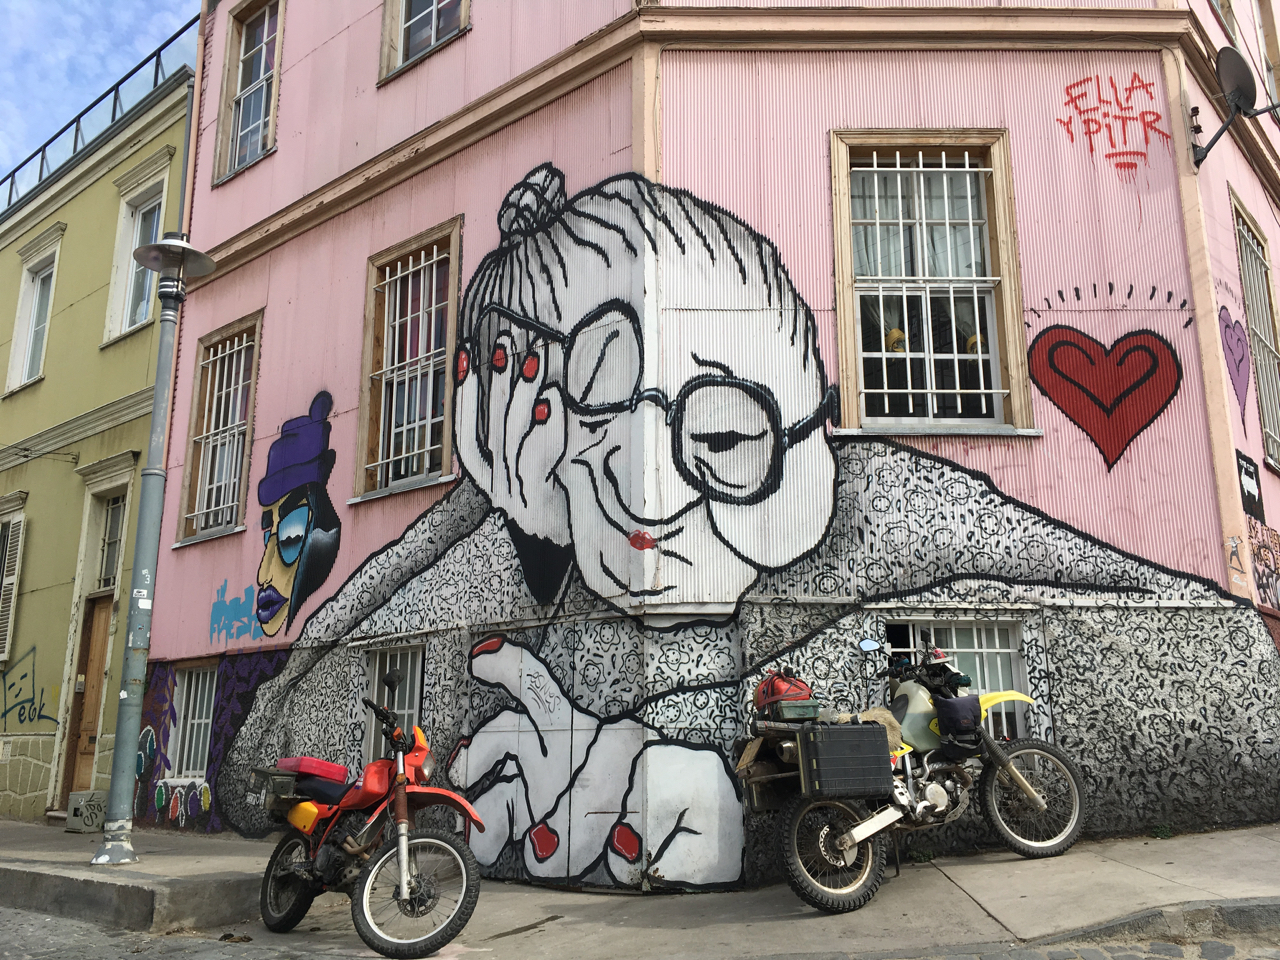 Chile_Valparaisograffiti14